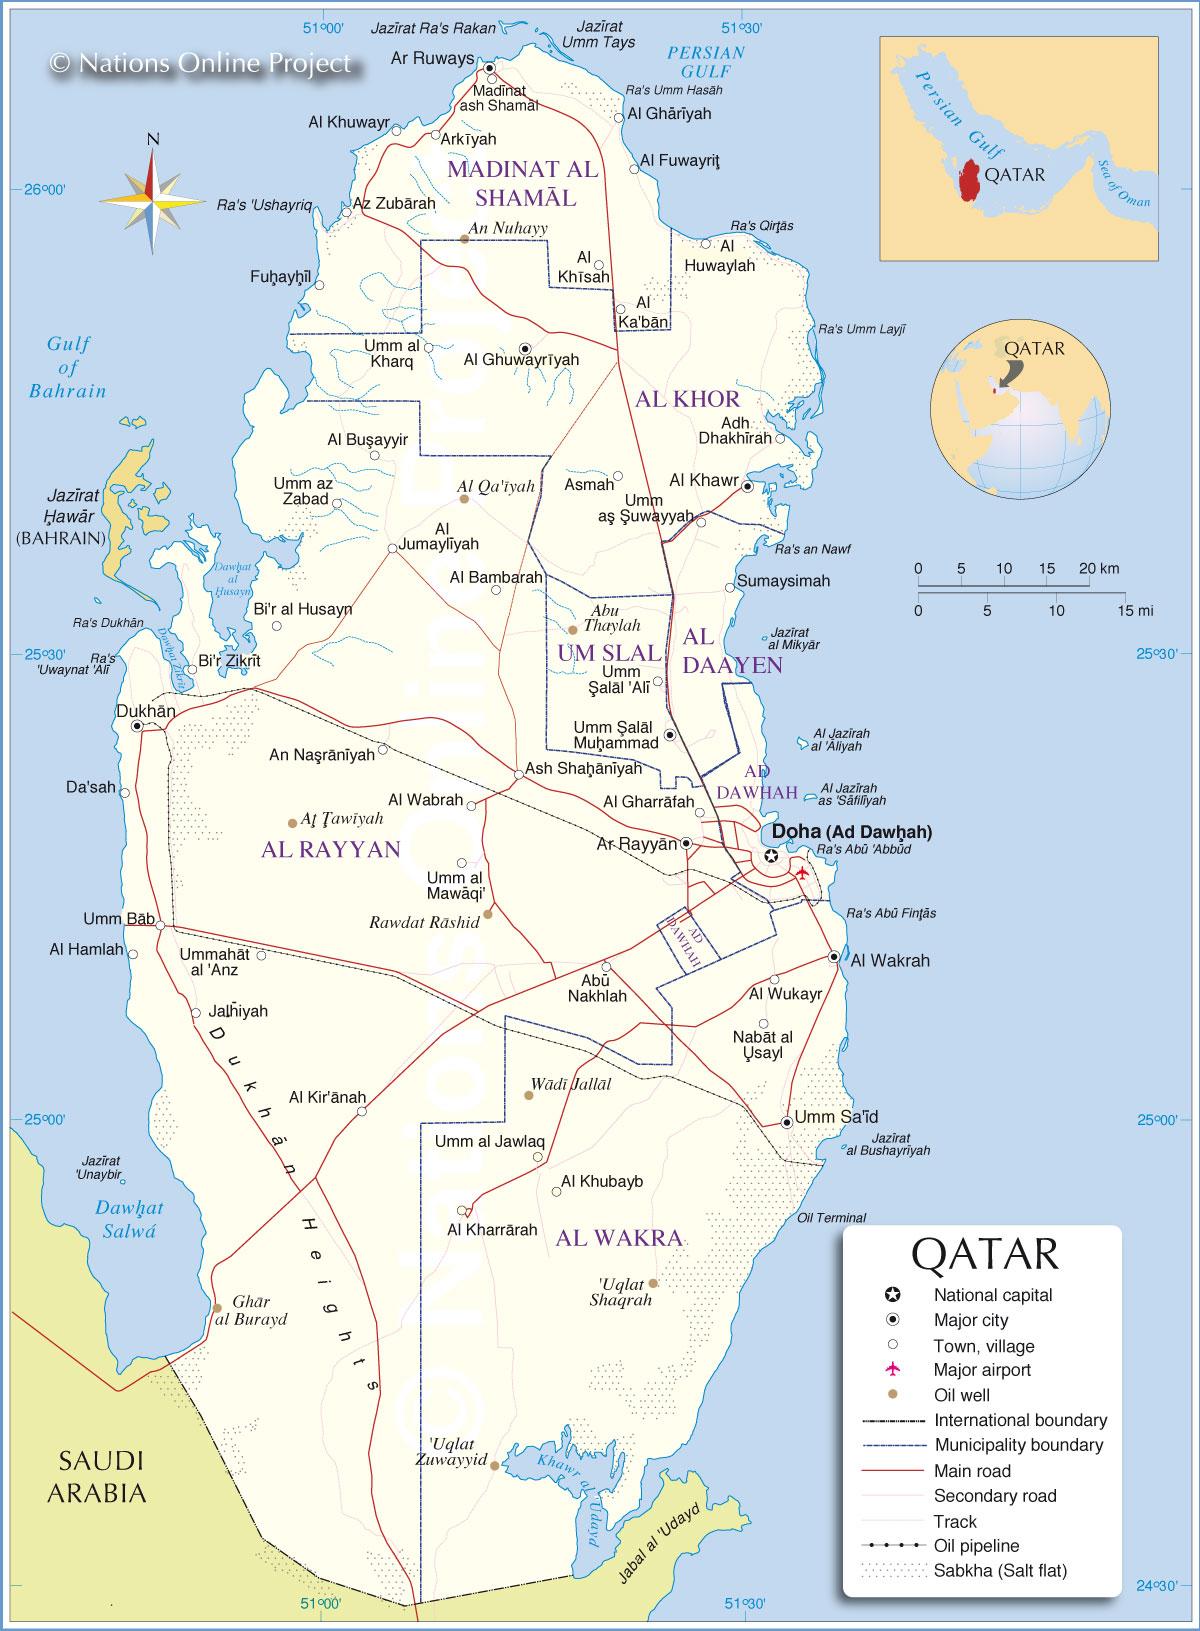 Image - Qatar-map.jpg | Libedia | FANDOM powered by Wikia on kenya map, angola map, luxembourg map, middle east map, bahrain map, namibia map, japan map, rwanda map, asia map, zimbabwe map, united arab emirates map, madagascar map, uganda map, balkans map, kuwait map, algeria map, turkey map, malawi map, niger map, ghana map, senegal map, u.a.e. map, cameroon map, ethiopia map, jordan map, mozambique map, tunisia map, abu dhabi map, asian countries map, syria map, burundi map, sudan map, dubai map, morocco map, aruba map, mali map, israel map, iraq map, persian gulf map,